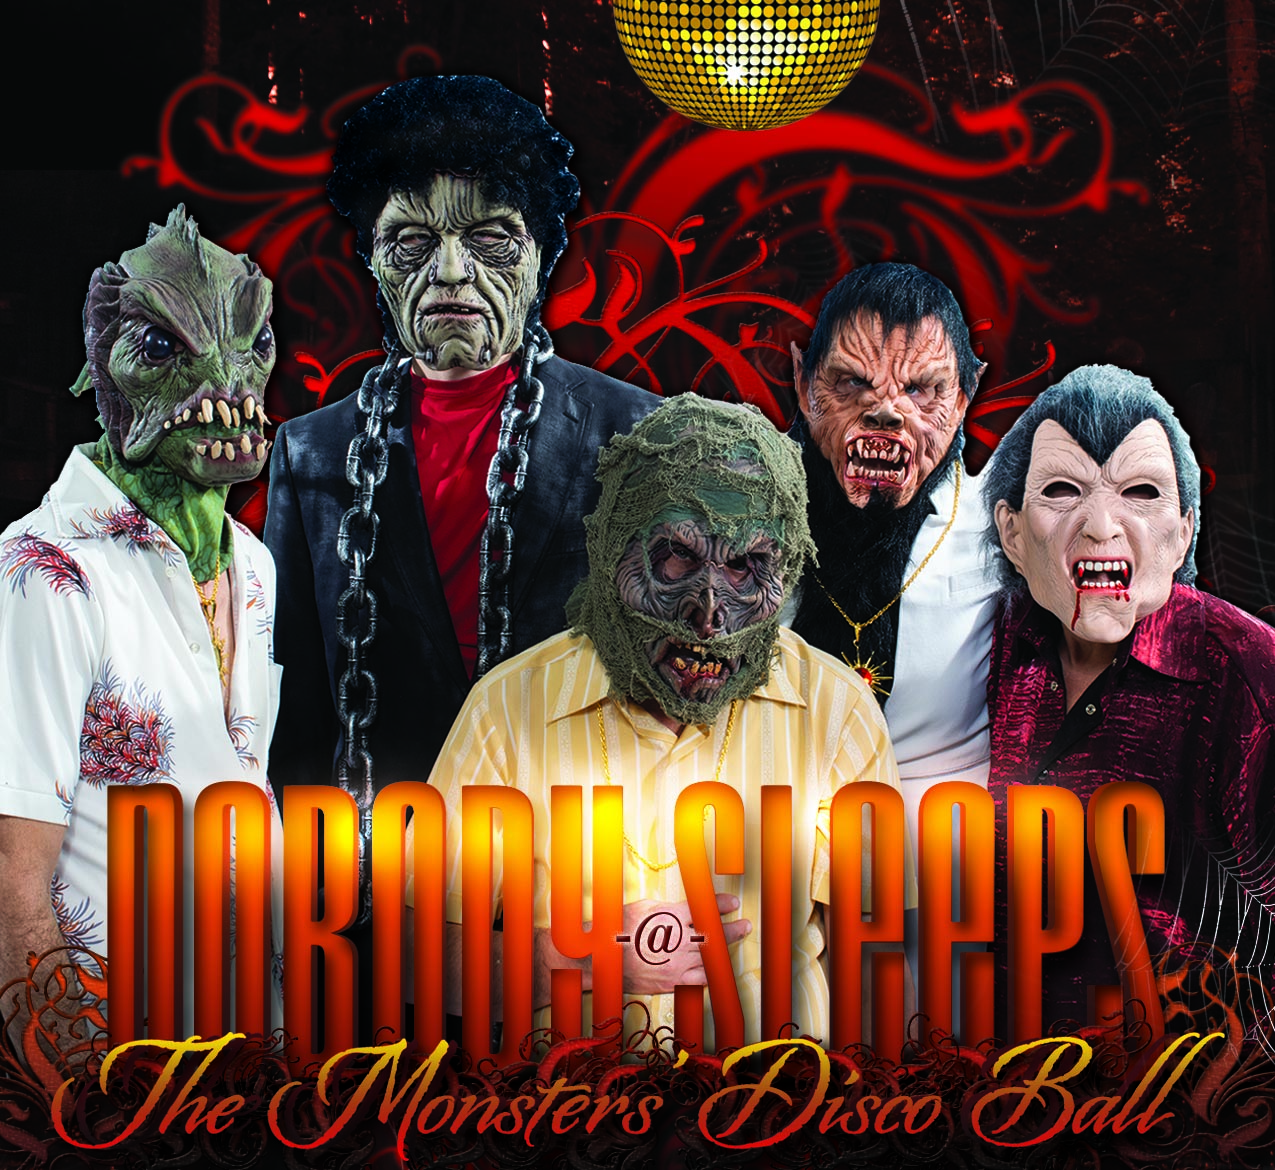 Monsters Disco Ball Image 2019